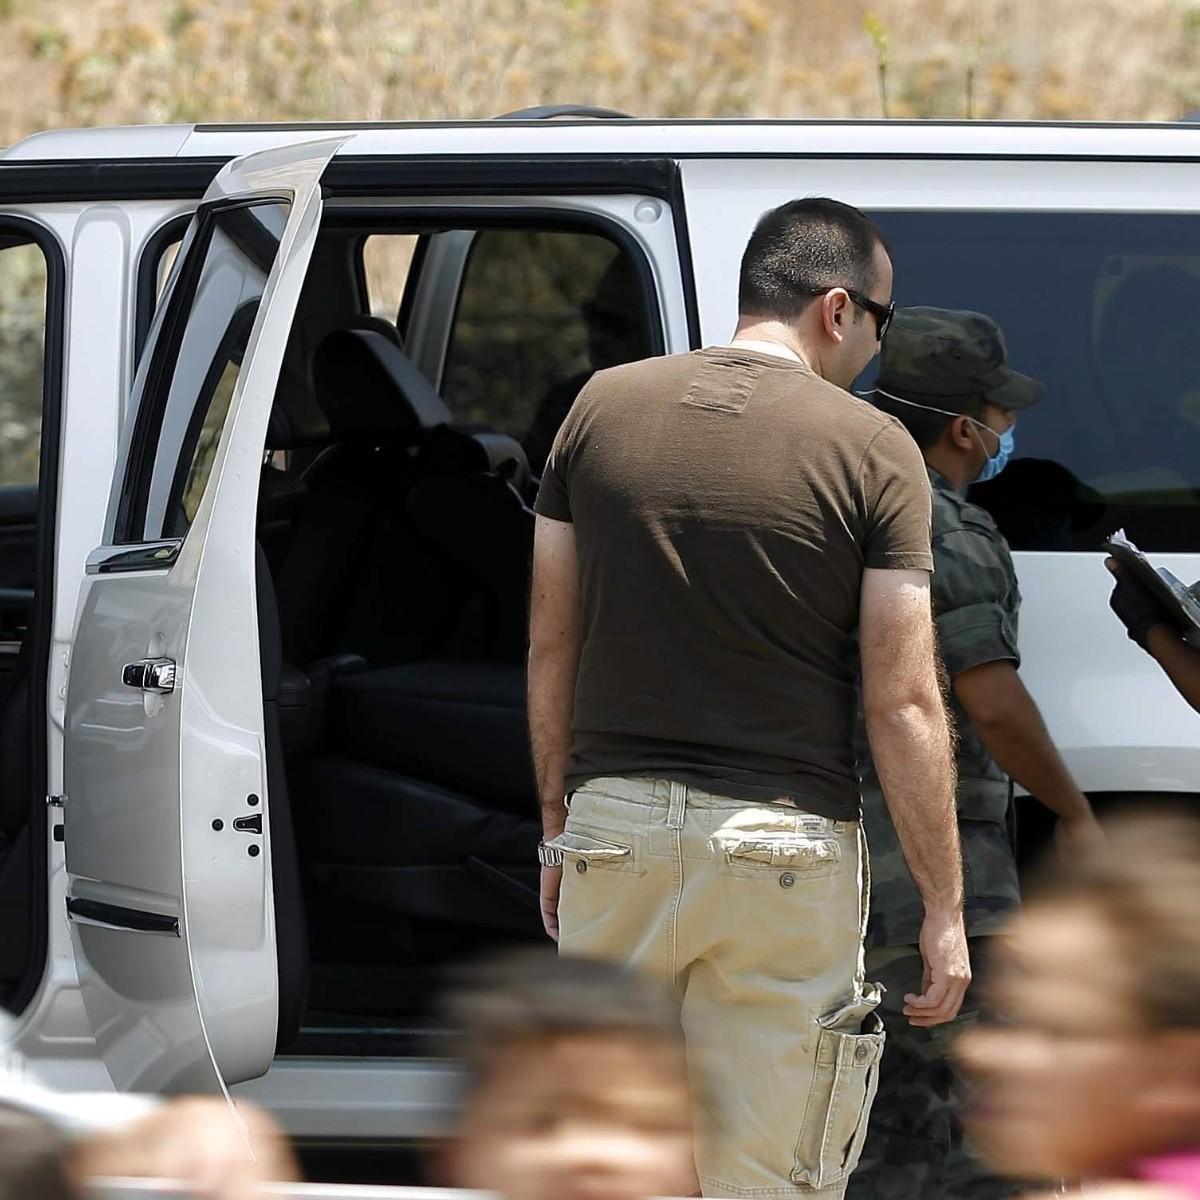 Mexico Unico De 126 Paises Con Alza En Robo De Autos El